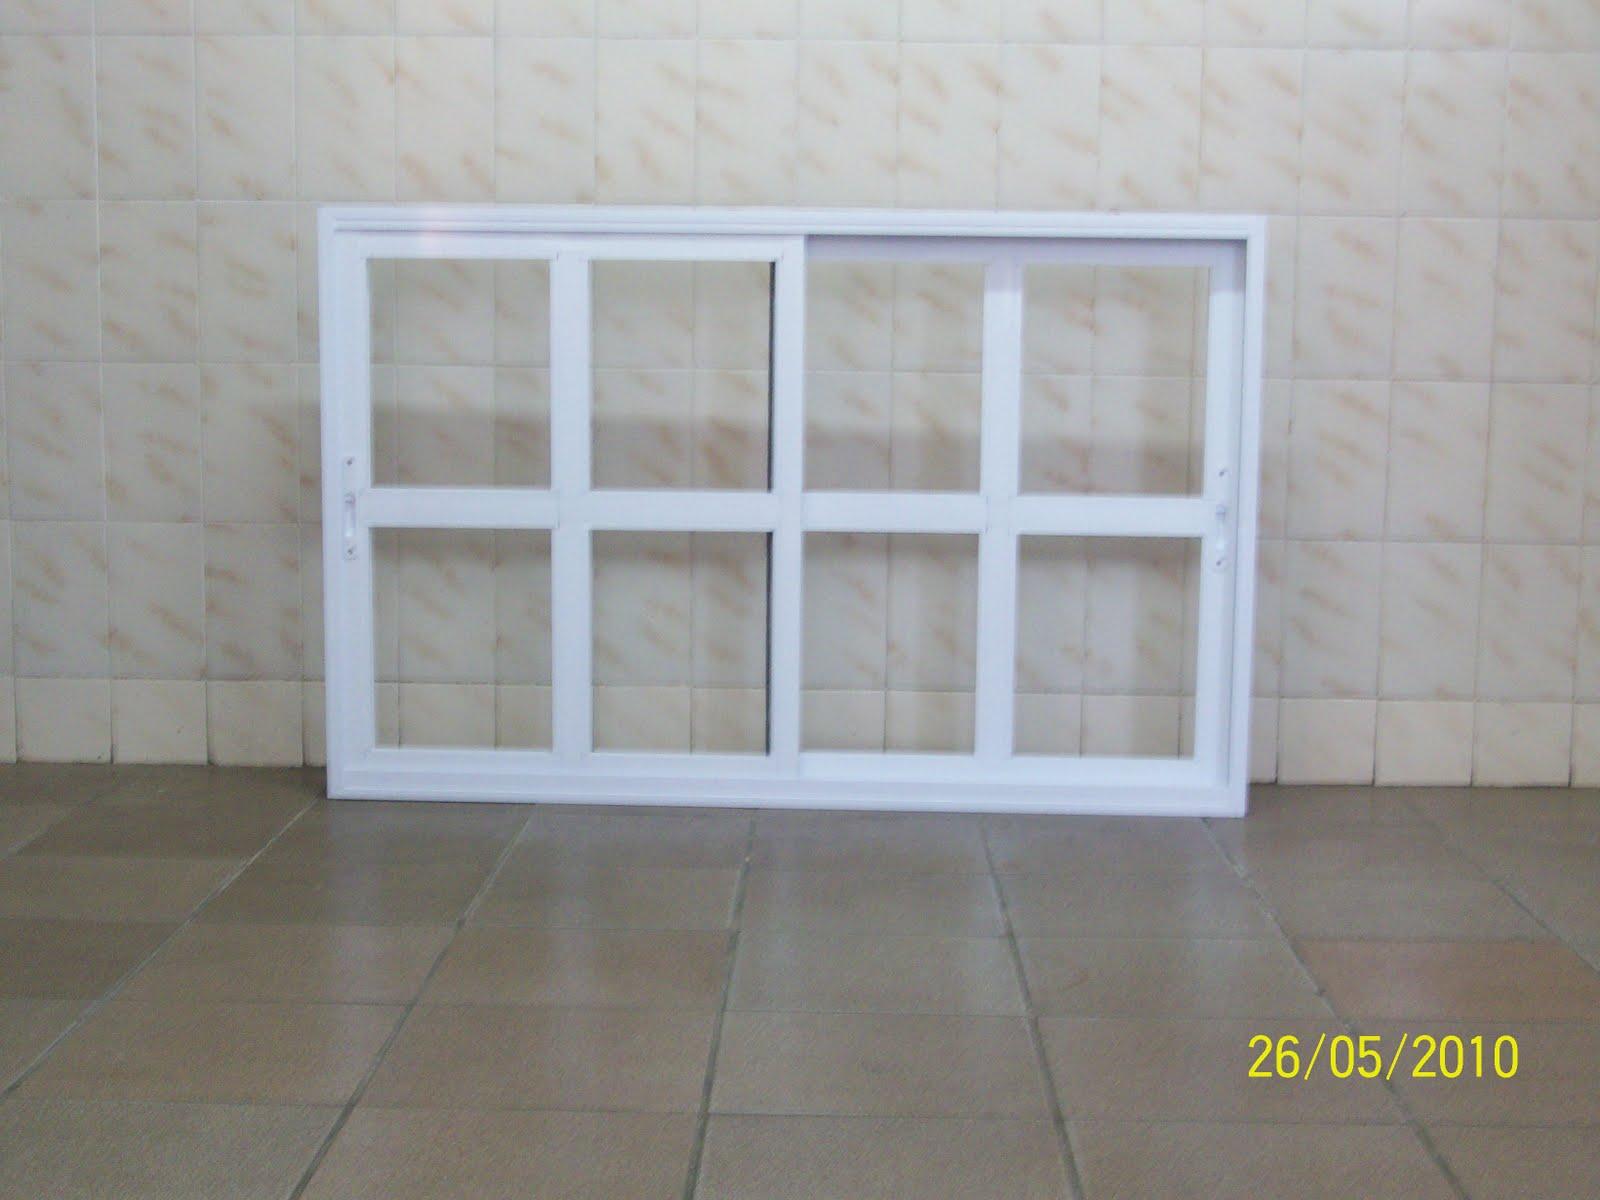 #A6A525 IPAL ESQUADRIAS DE ALUMINIO E VIDROS 760 Joli Janelas De Aluminio Branco